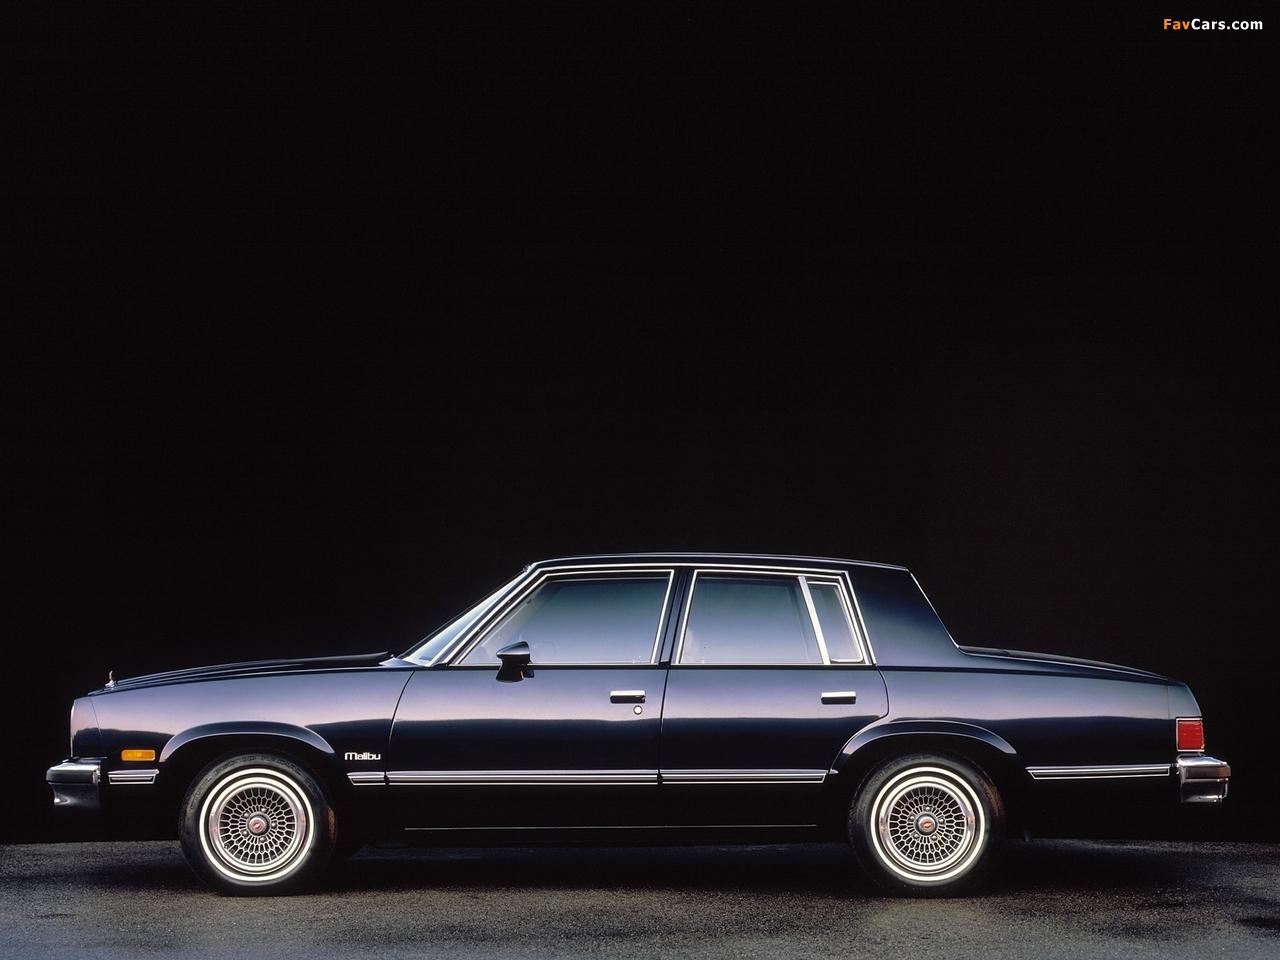 Chevrolet Malibu Classic 1983 pictures (1280 x 960)